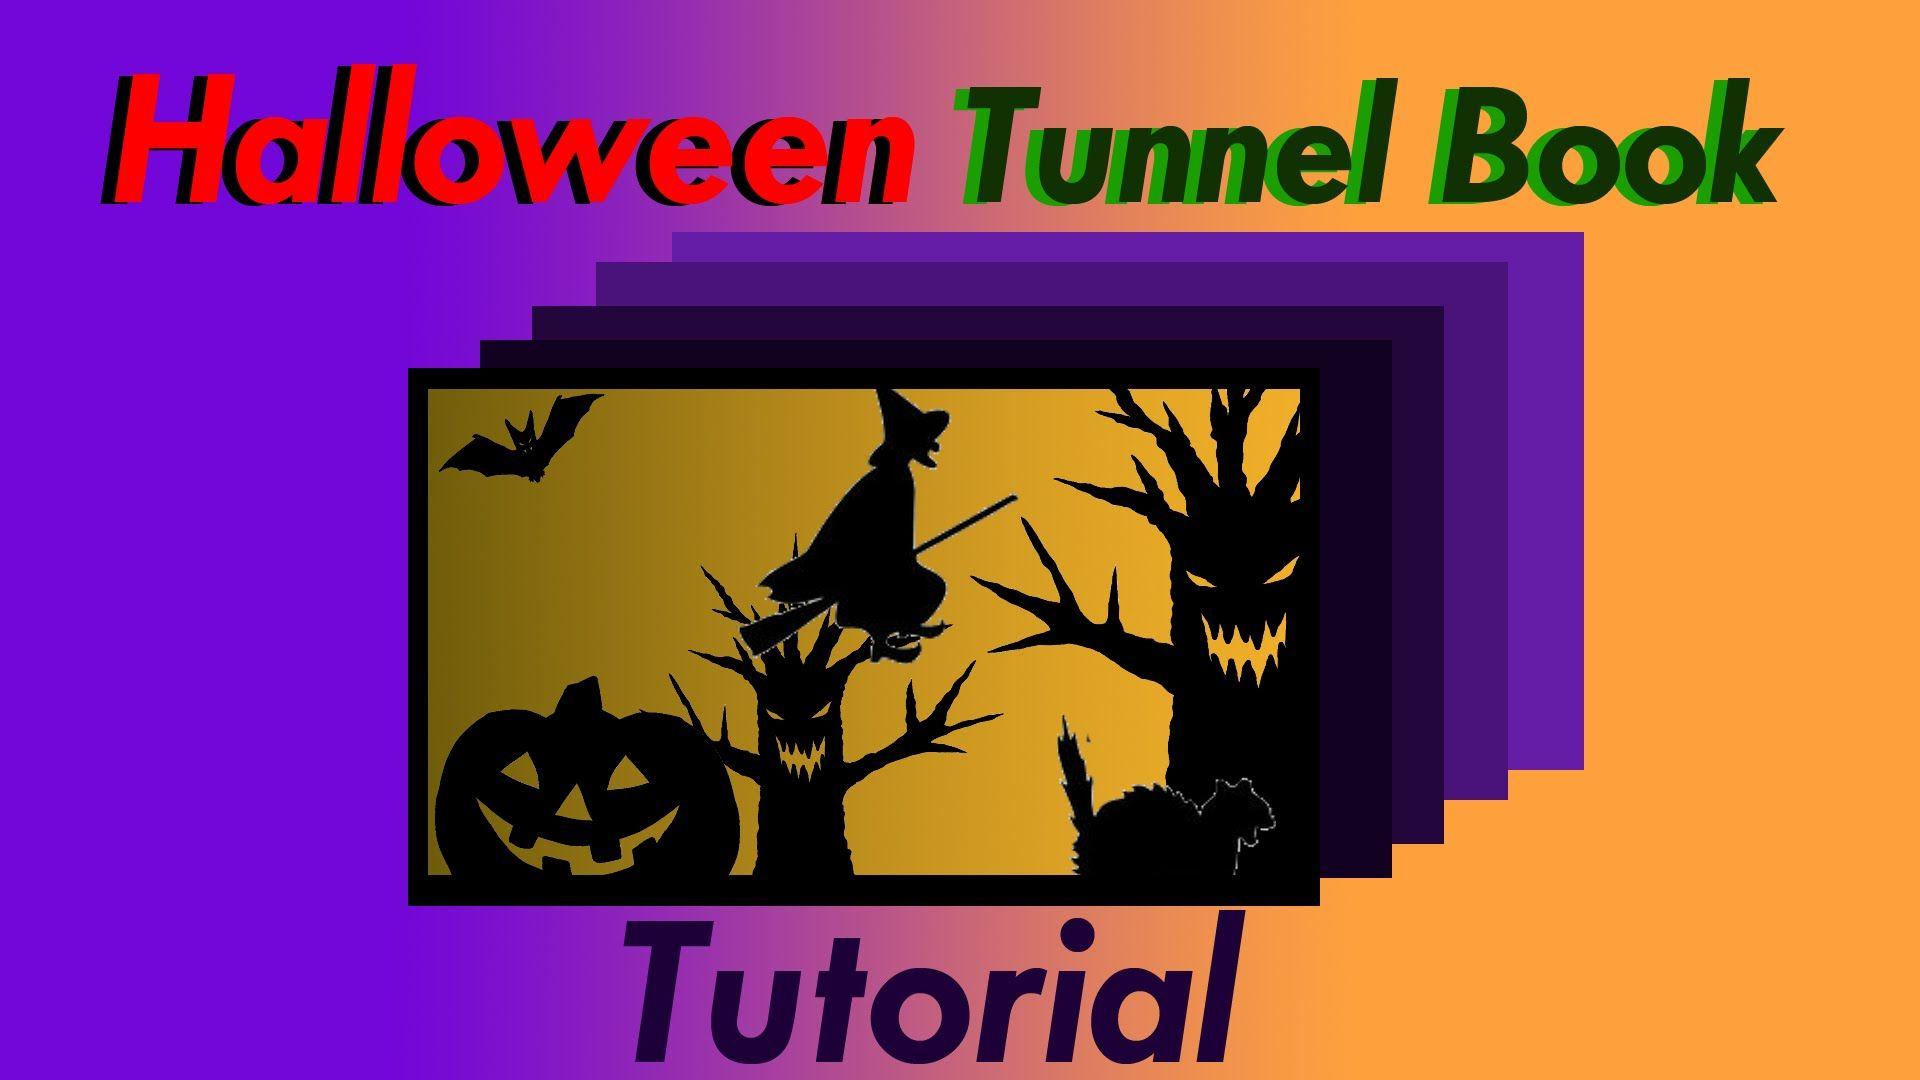 Halloween Tunnel Book - Diorama Craft Tutorial